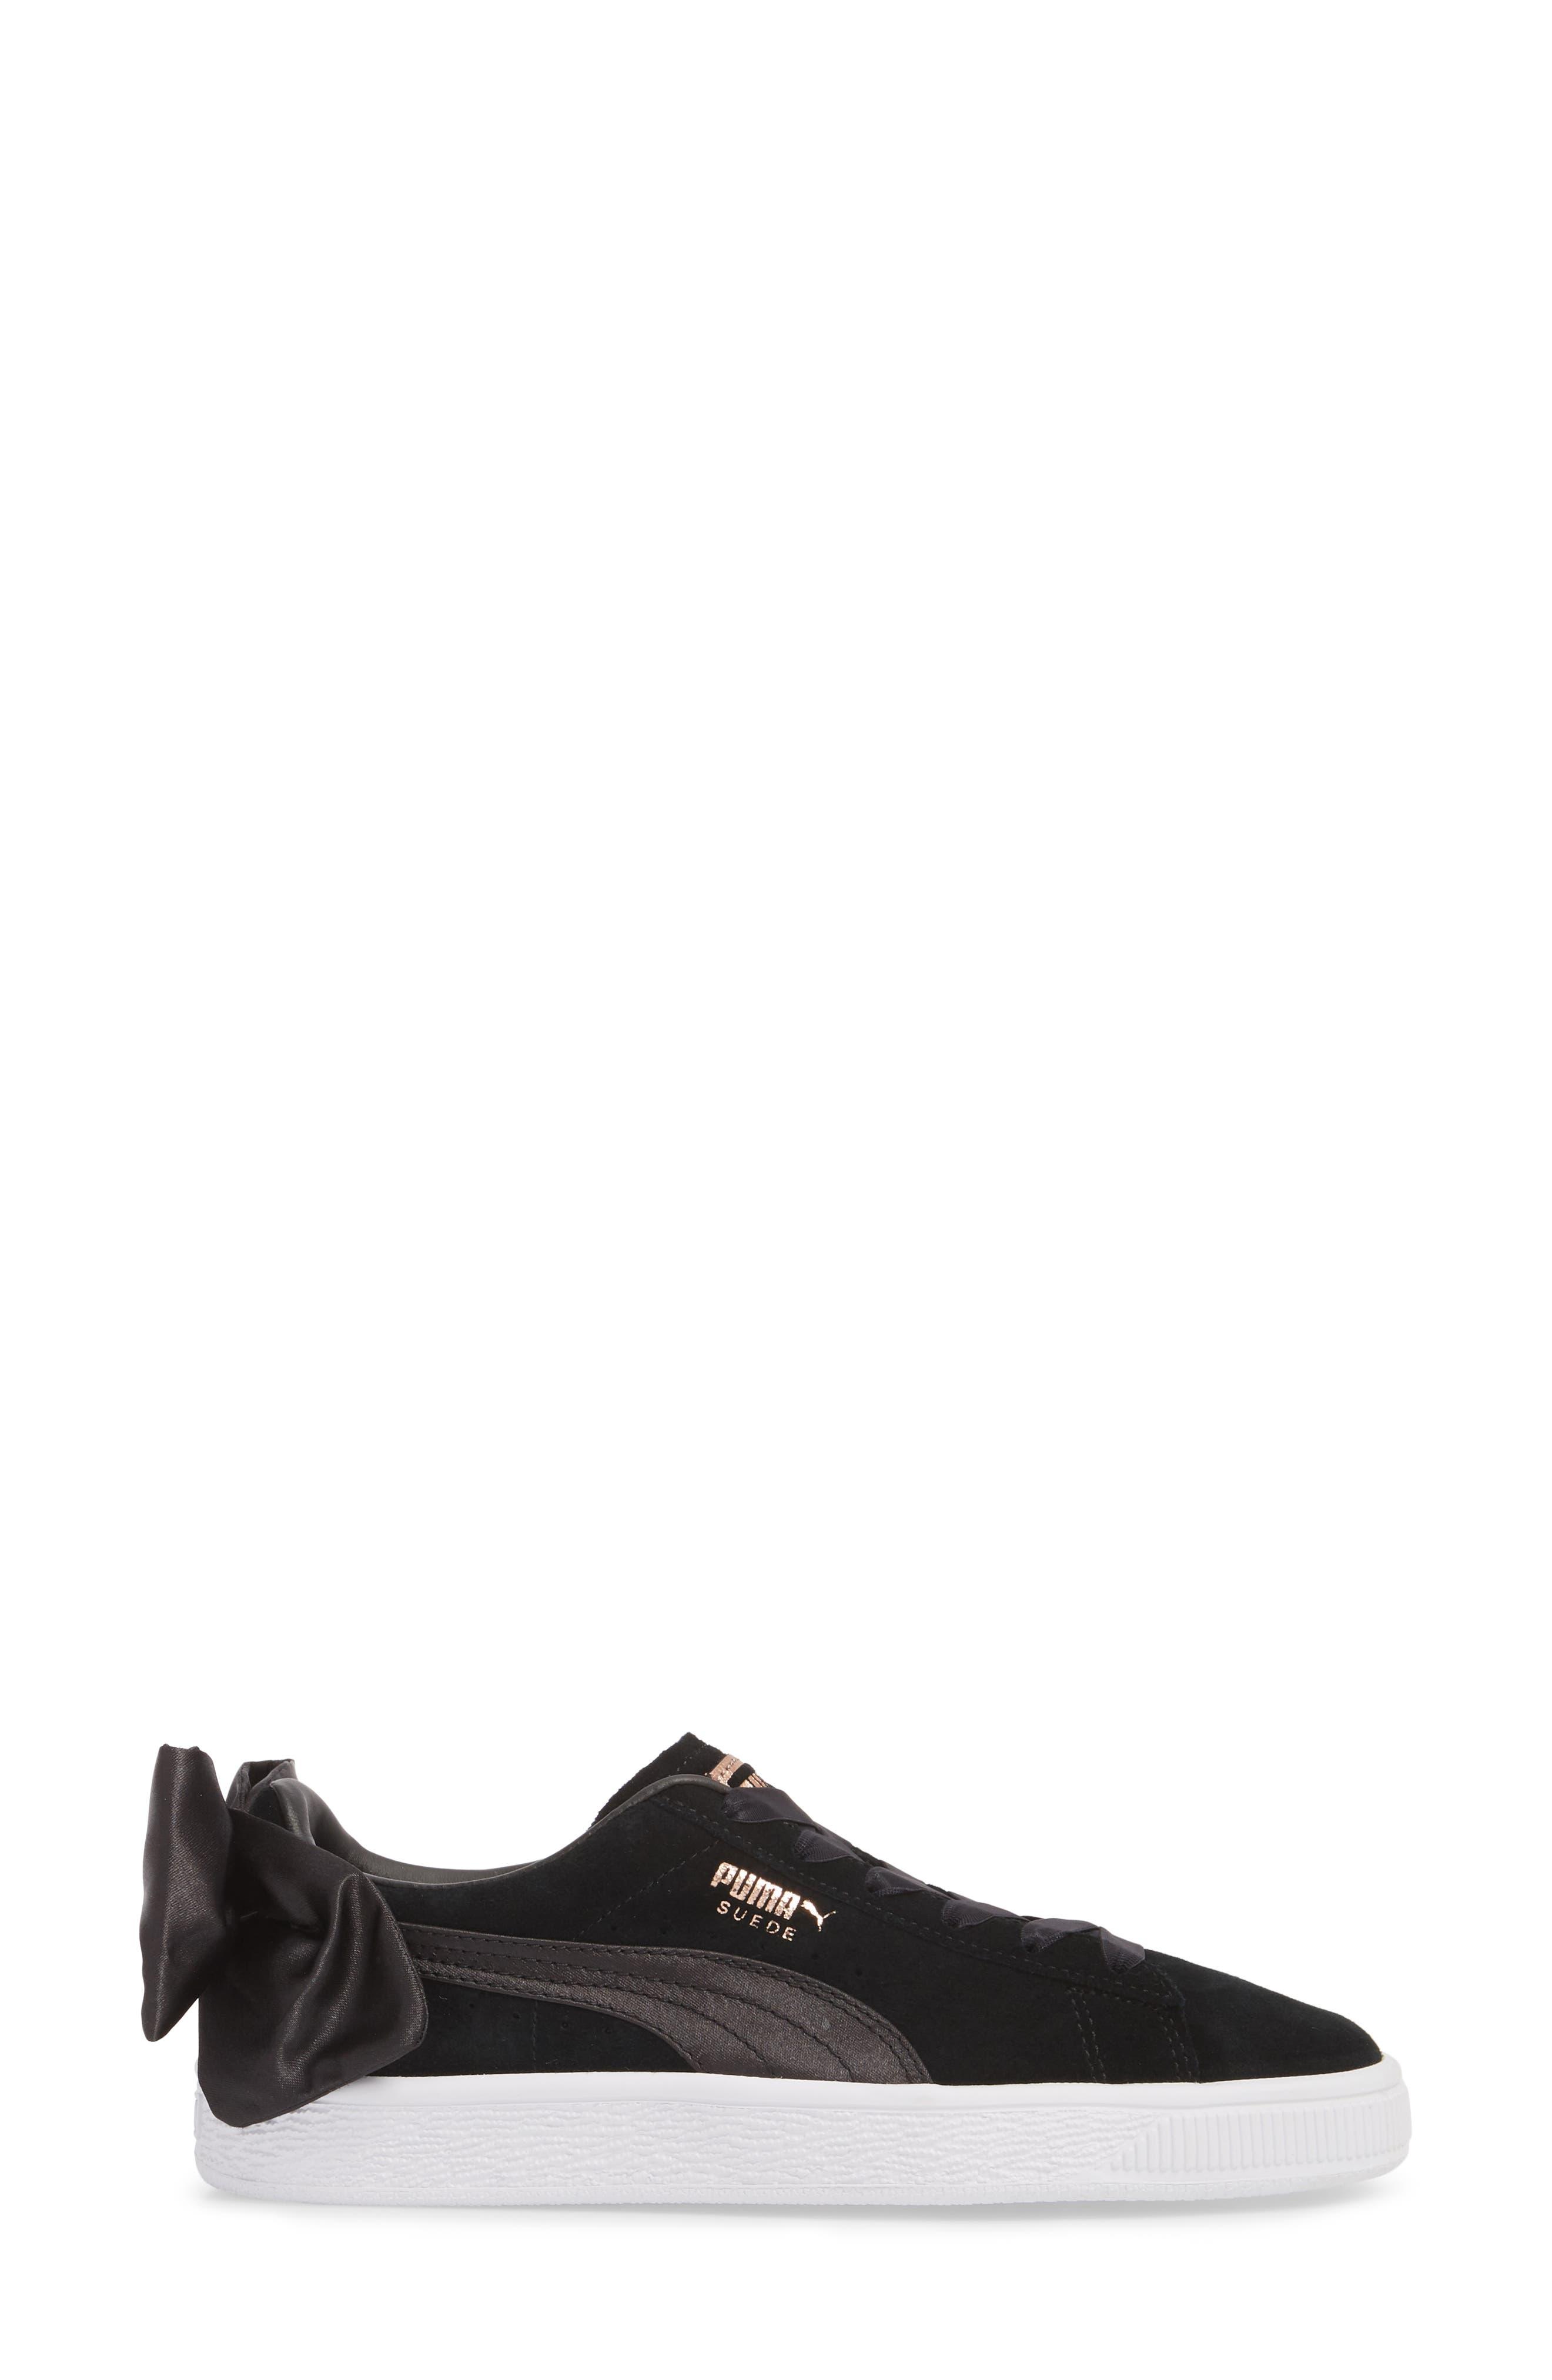 Bow Sneaker,                             Alternate thumbnail 3, color,                             Black/ Black